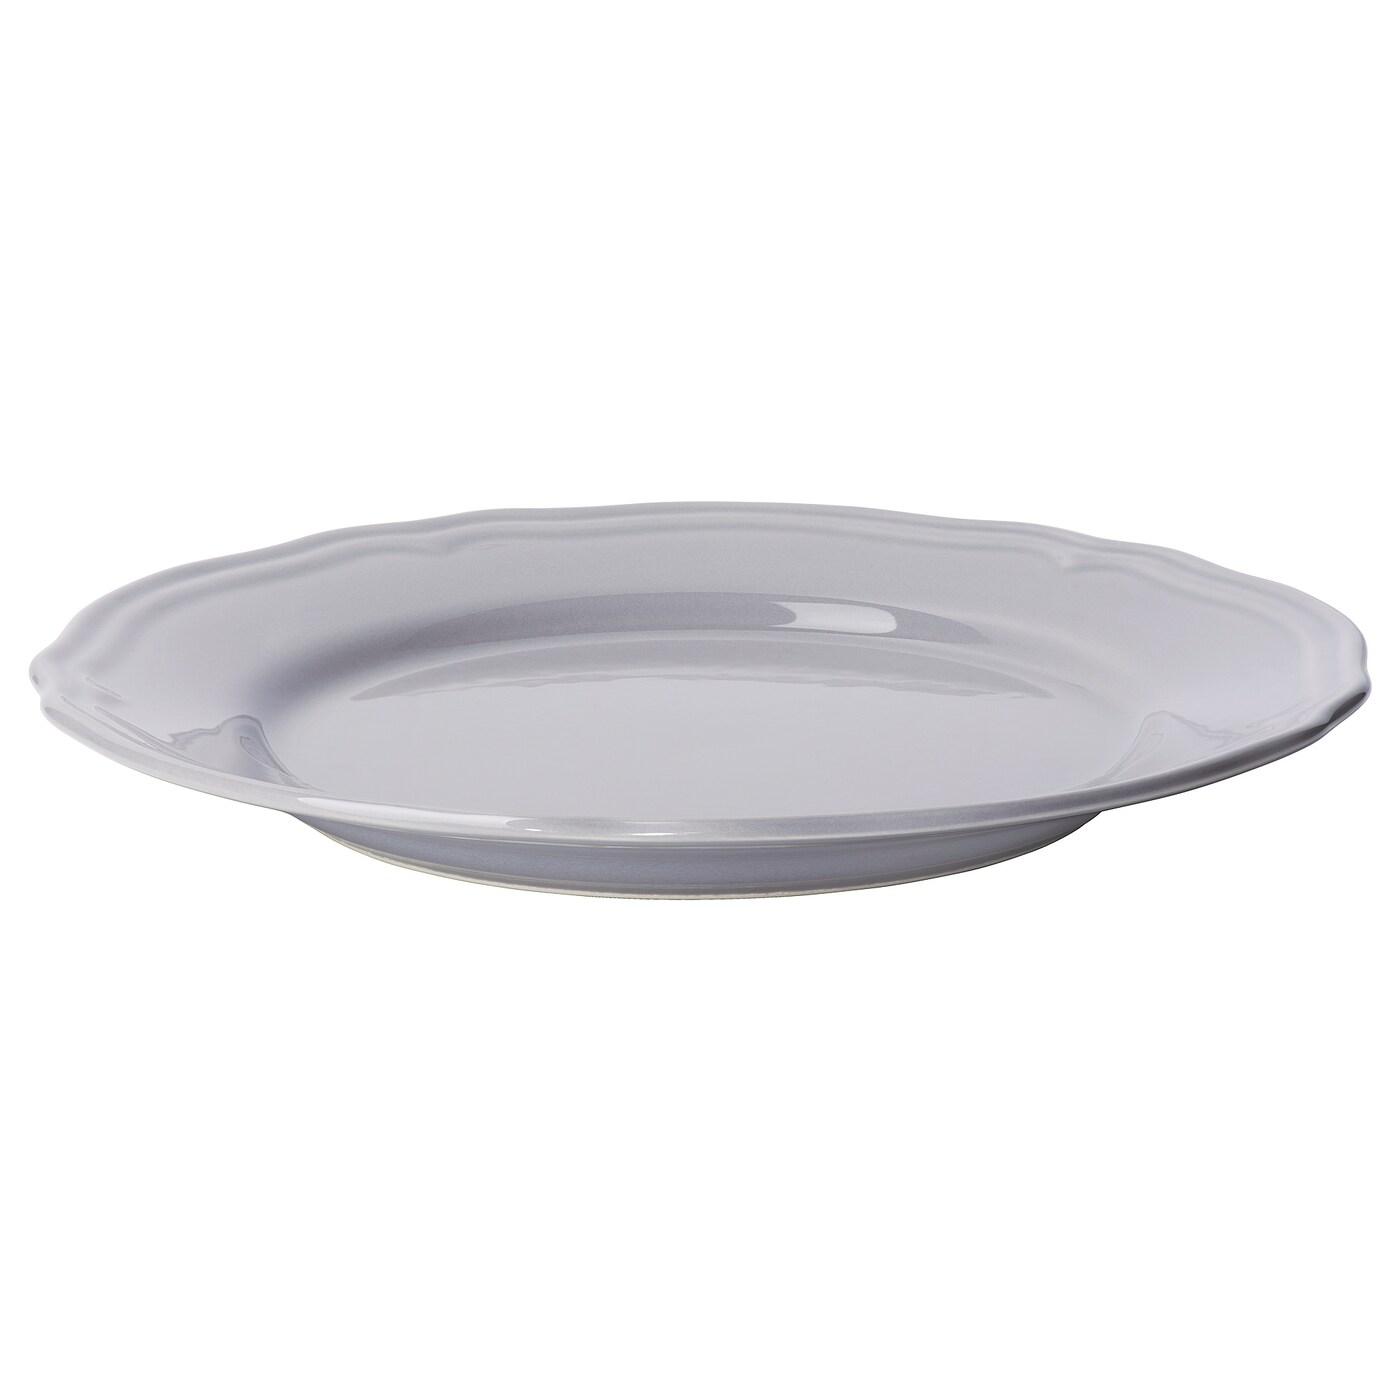 Arv assiette mauve fa ence 28 cm ikea - Ikea vaisselle de table ...